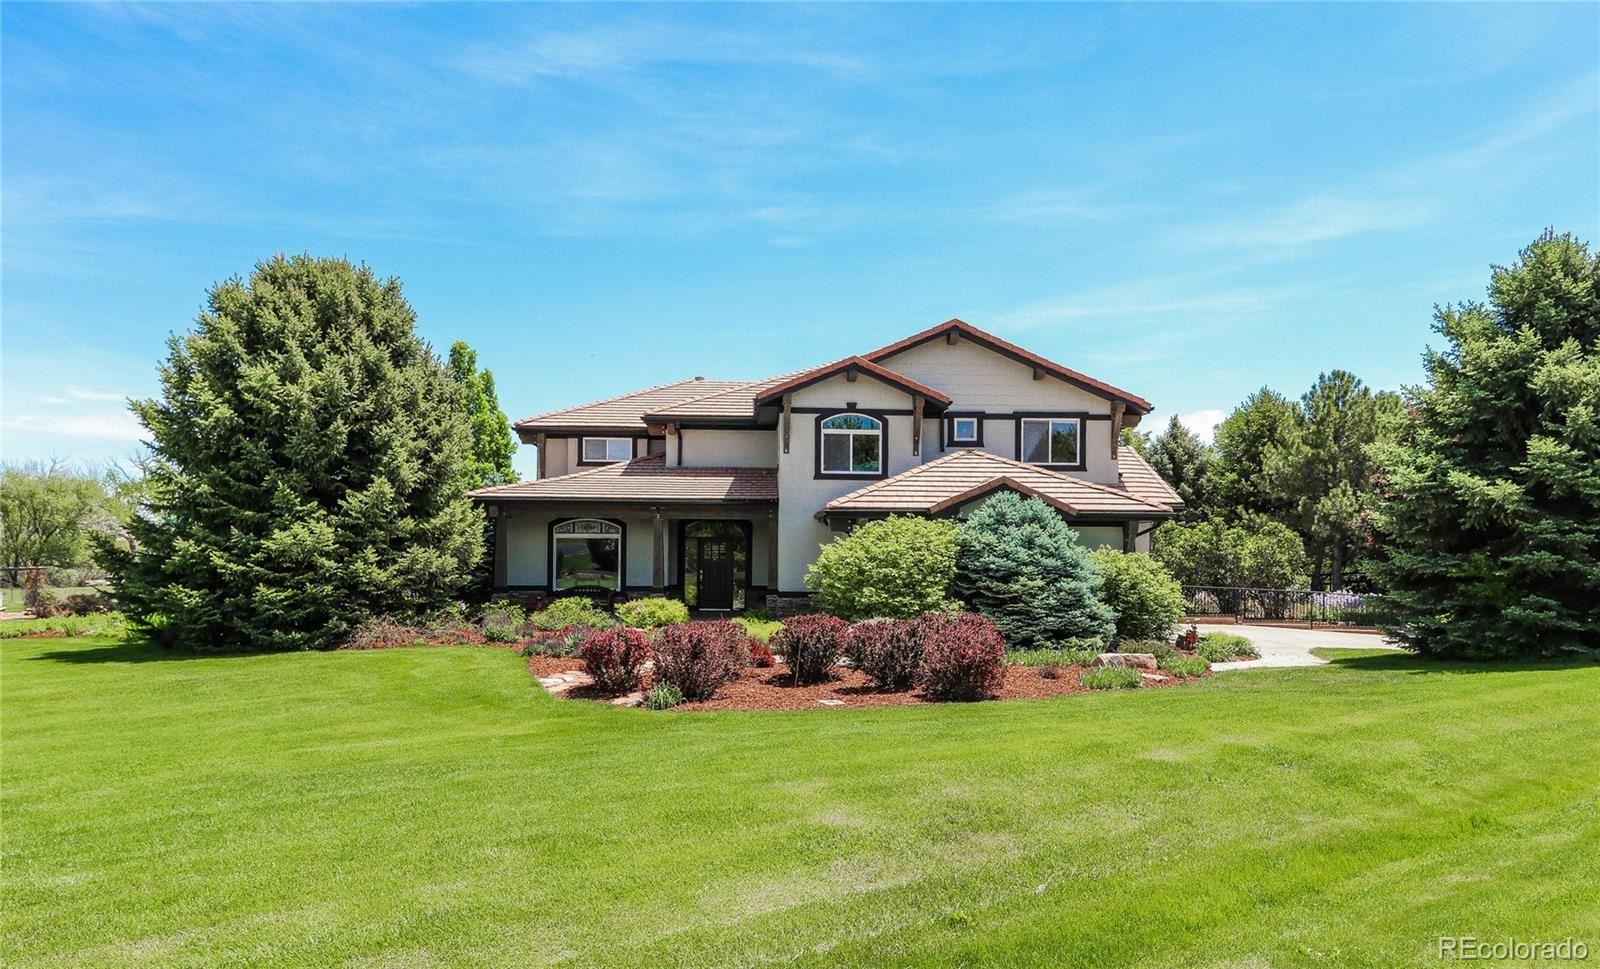 8890 Prairie Knoll Drive, Longmont, CO 80503 - #: 4883962